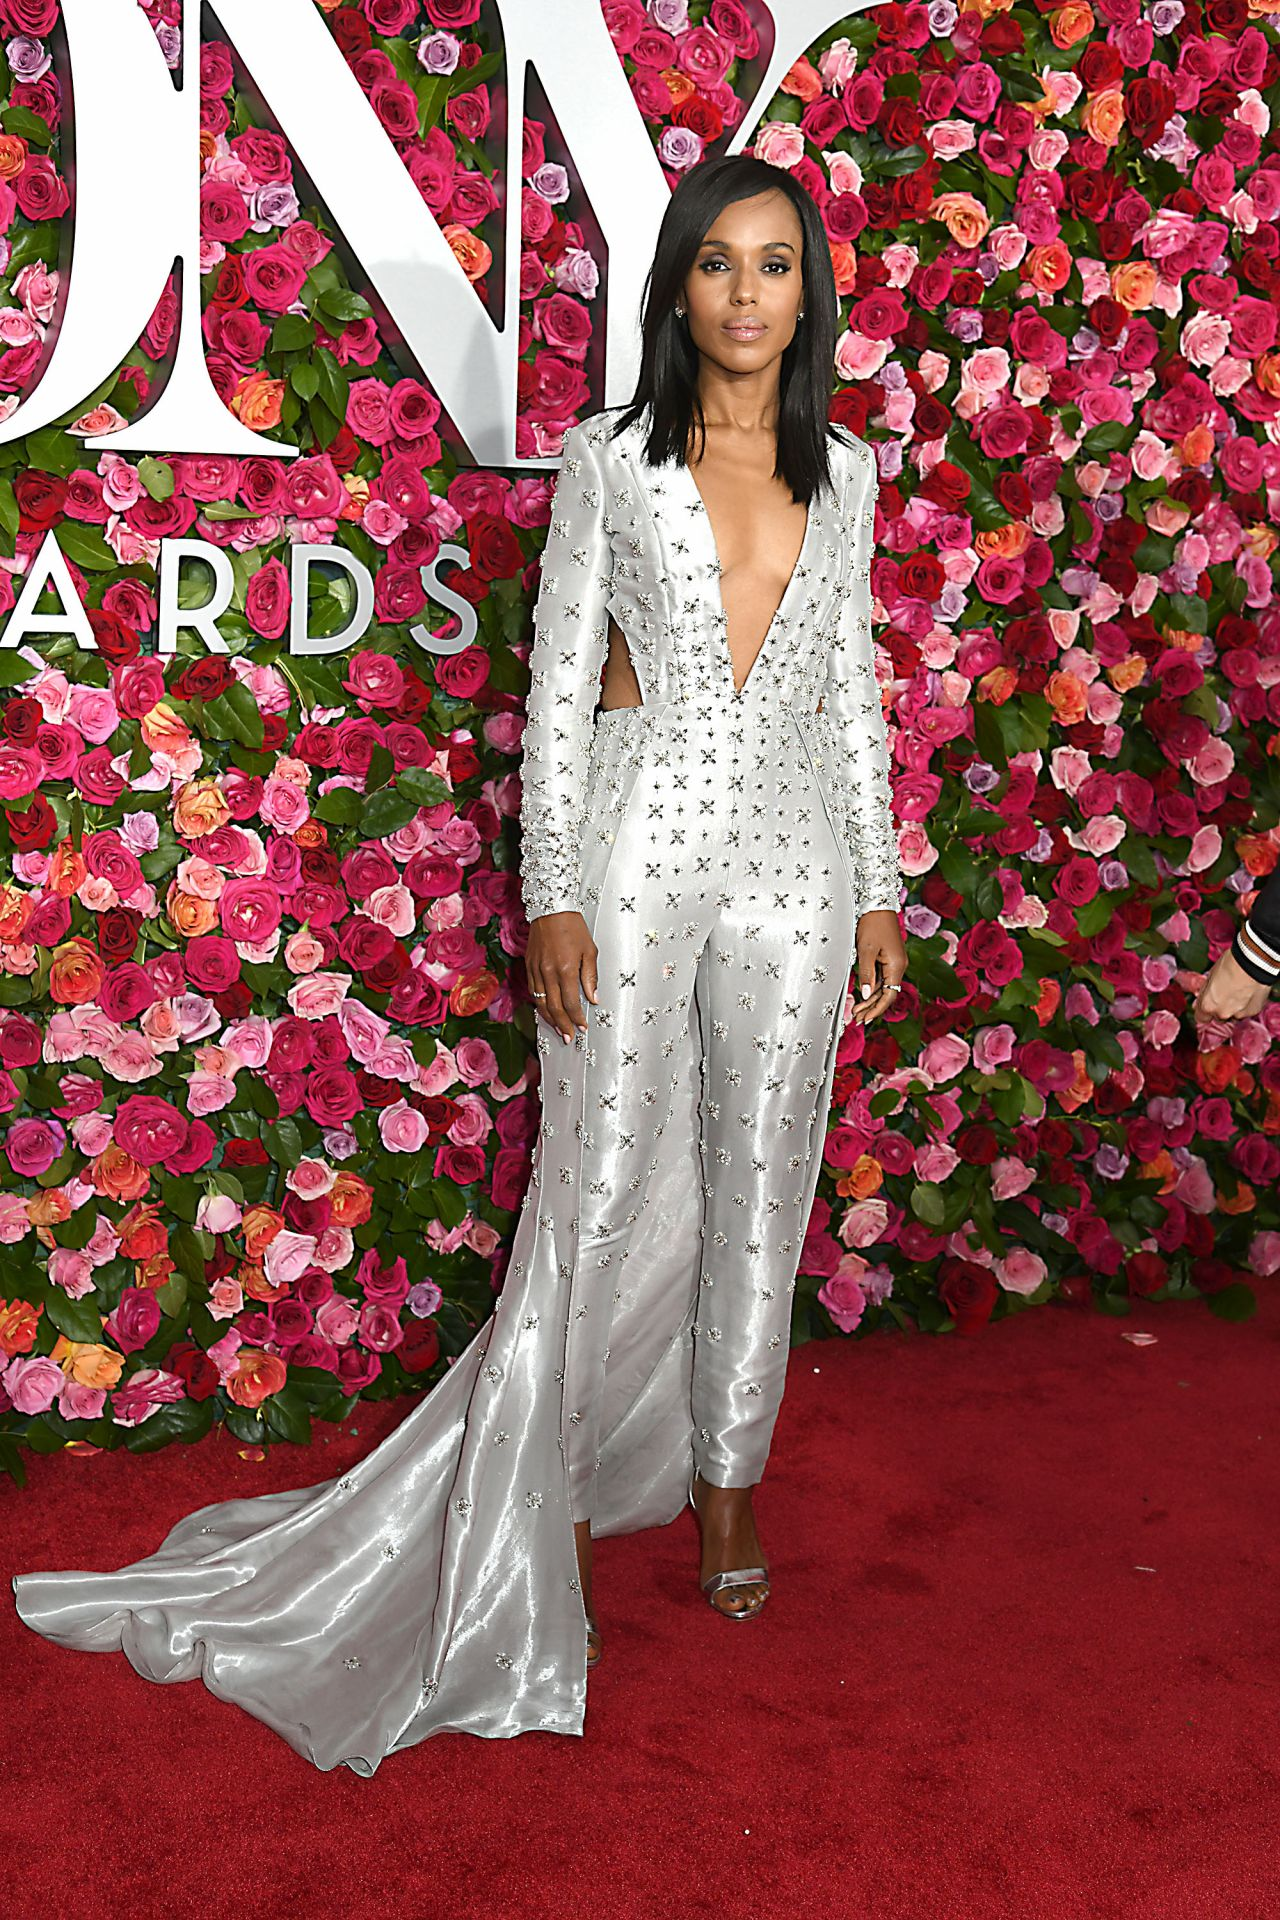 http://celebmafia.com/wp-content/uploads/2018/06/kerry-washington-72nd-annual-tony-awards-in-new-york-city-06-10-2018-1.jpg